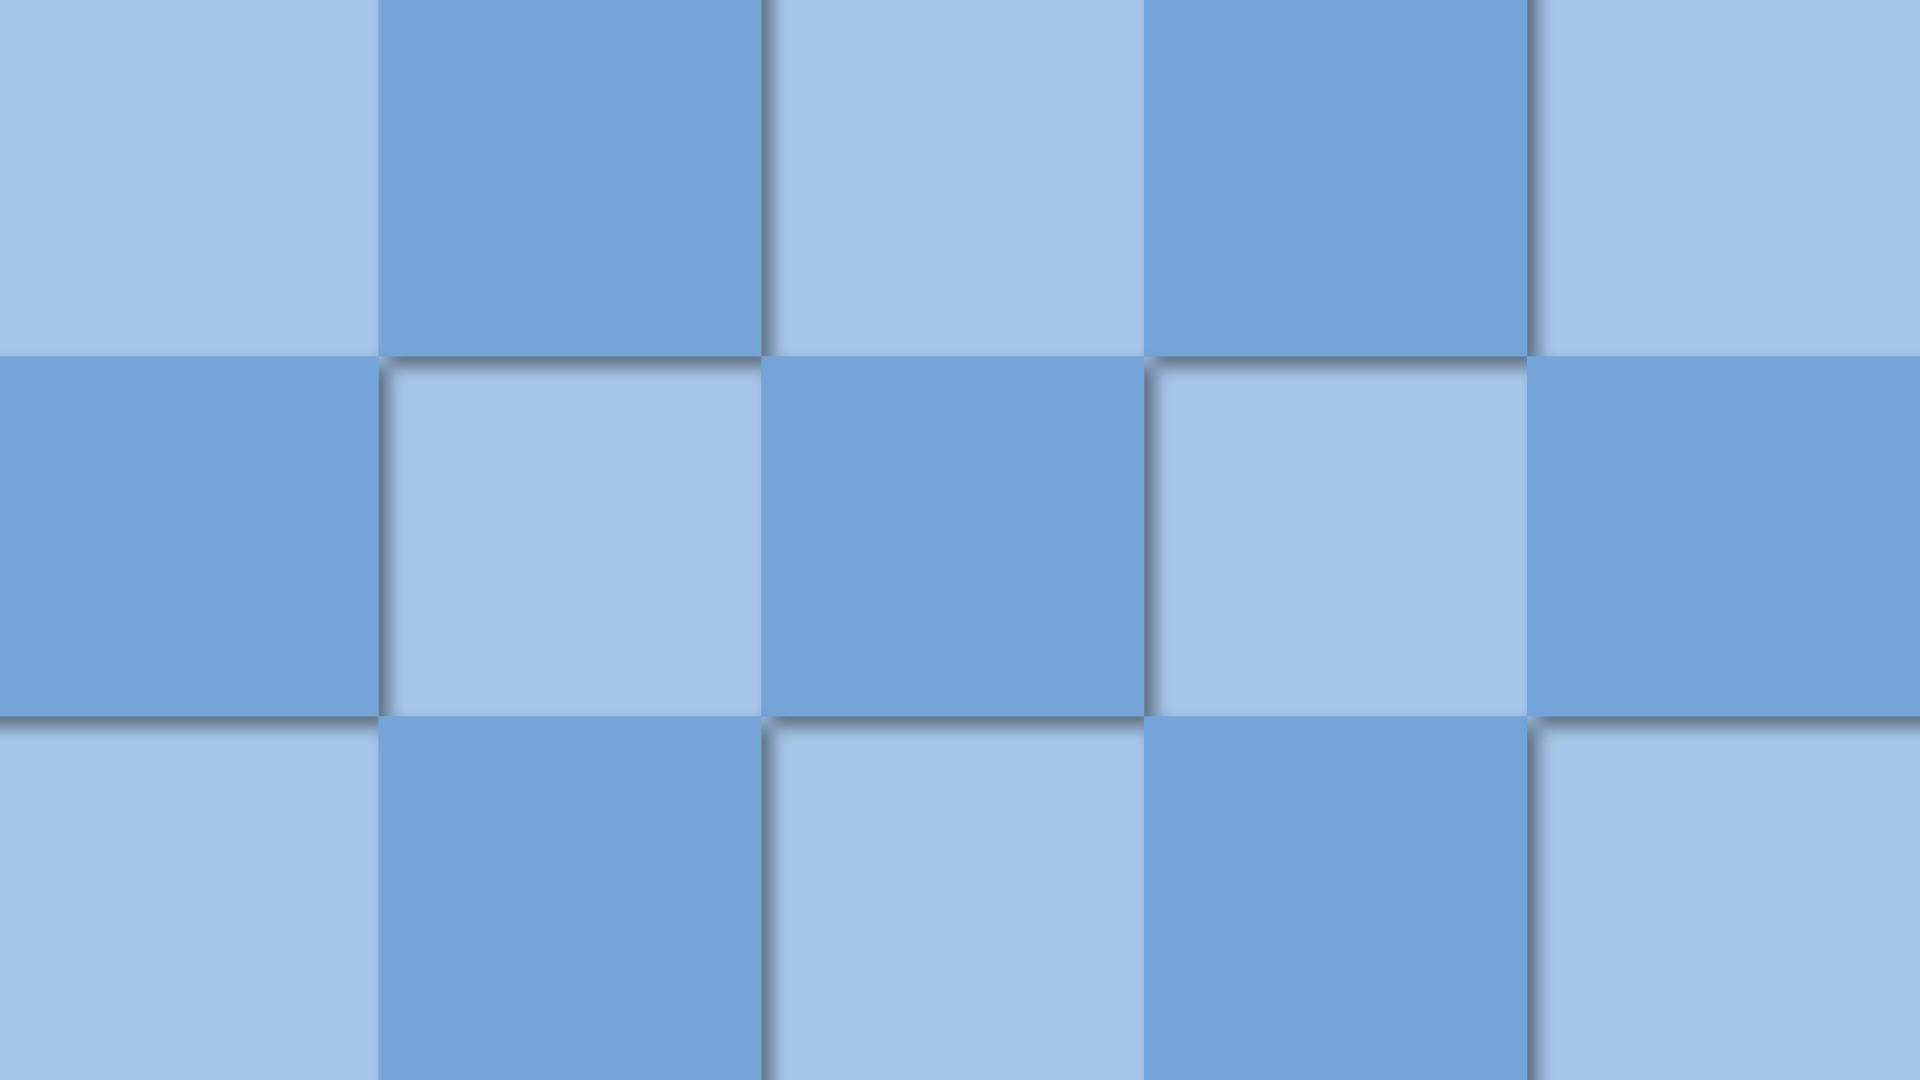 Tile grey plaid pattern or background wallpaper vector image